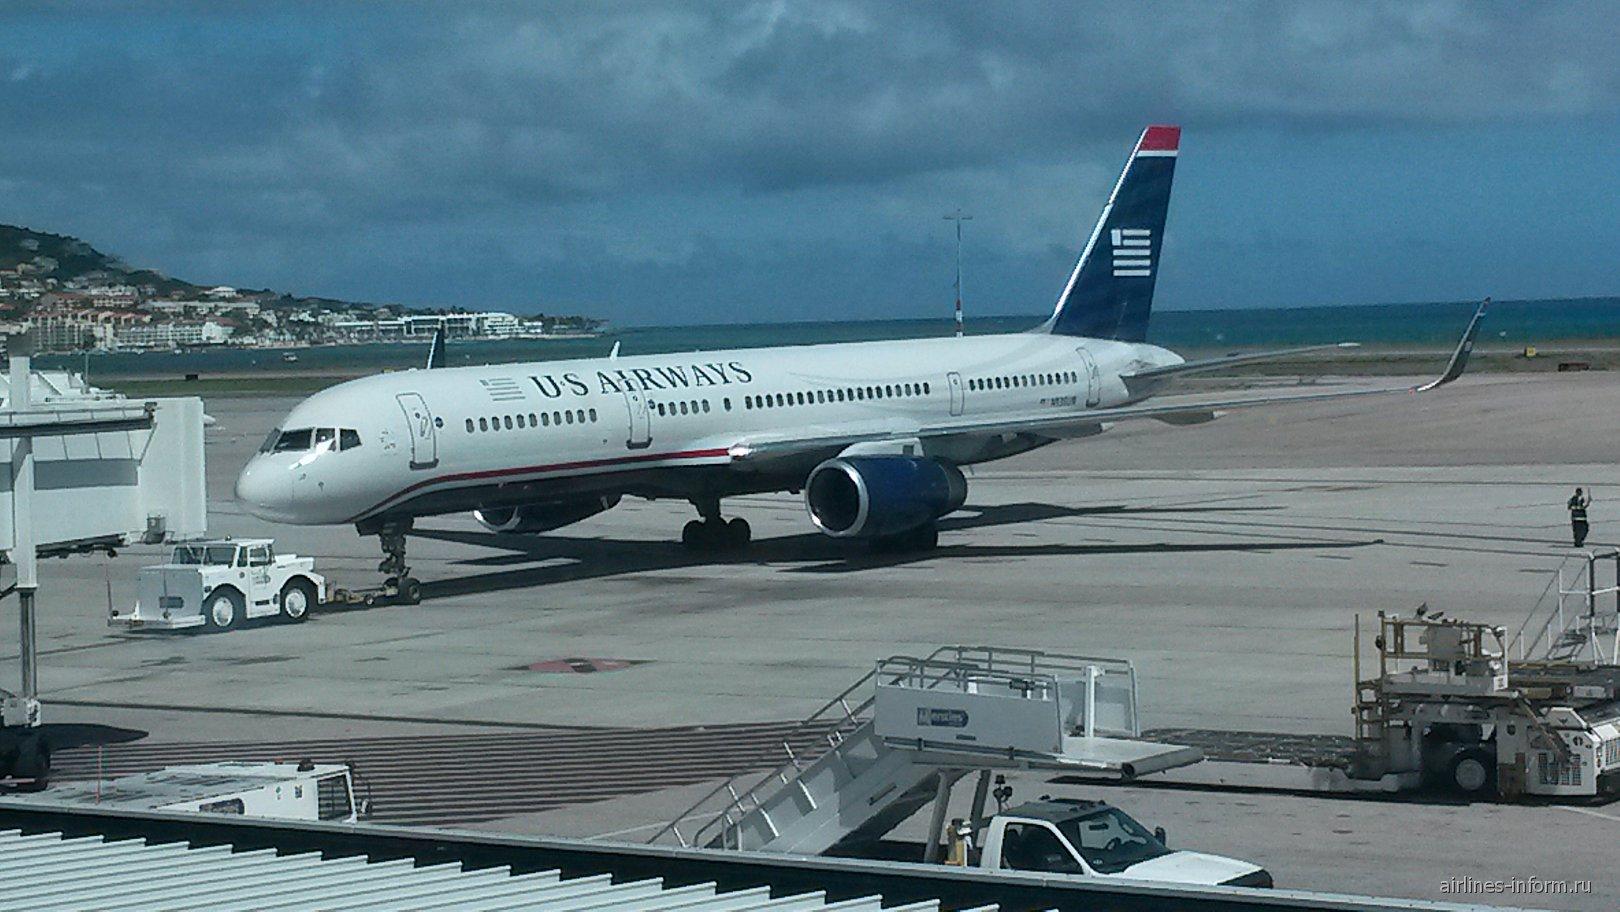 Боинг-757-200 авиакомпании US Airways в аэропорту Сен-Мартен